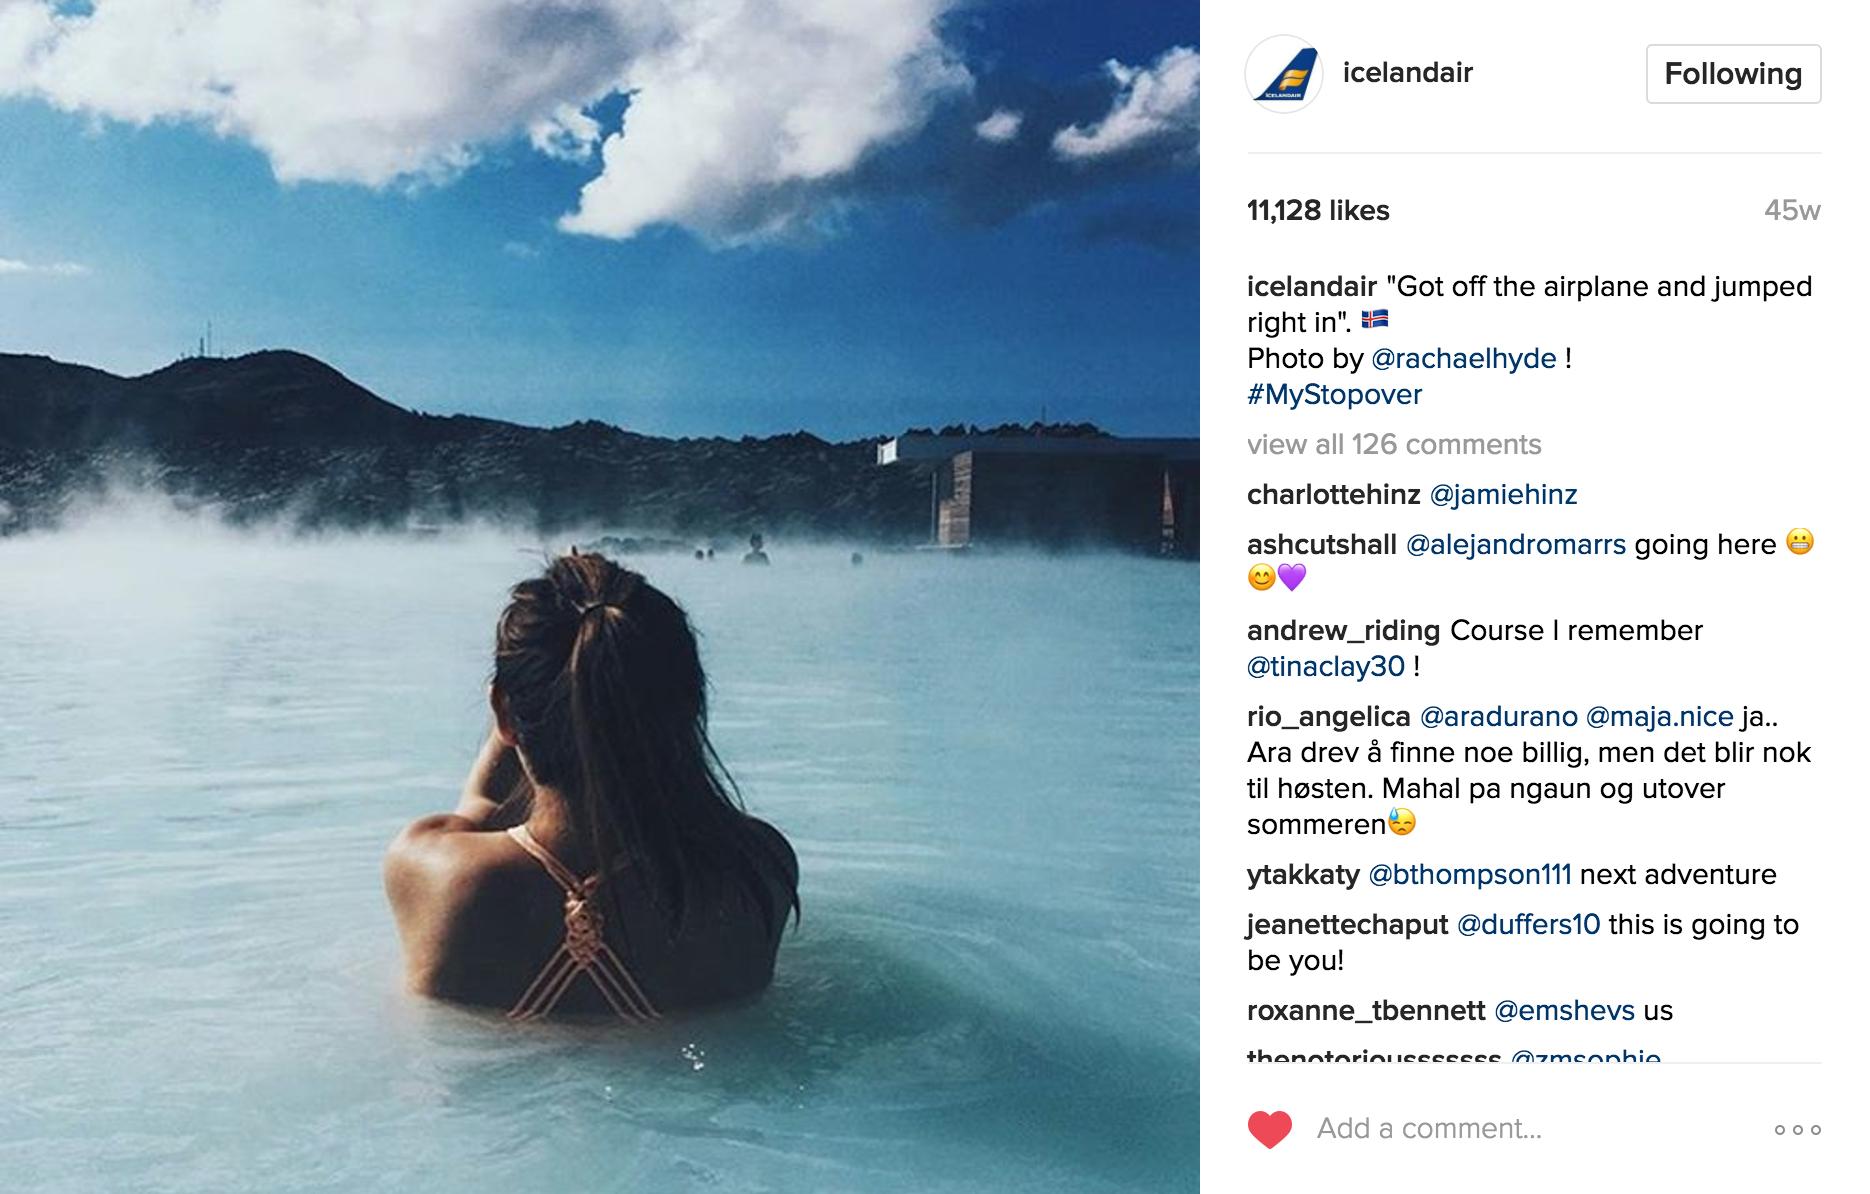 Iceland Air Instagram